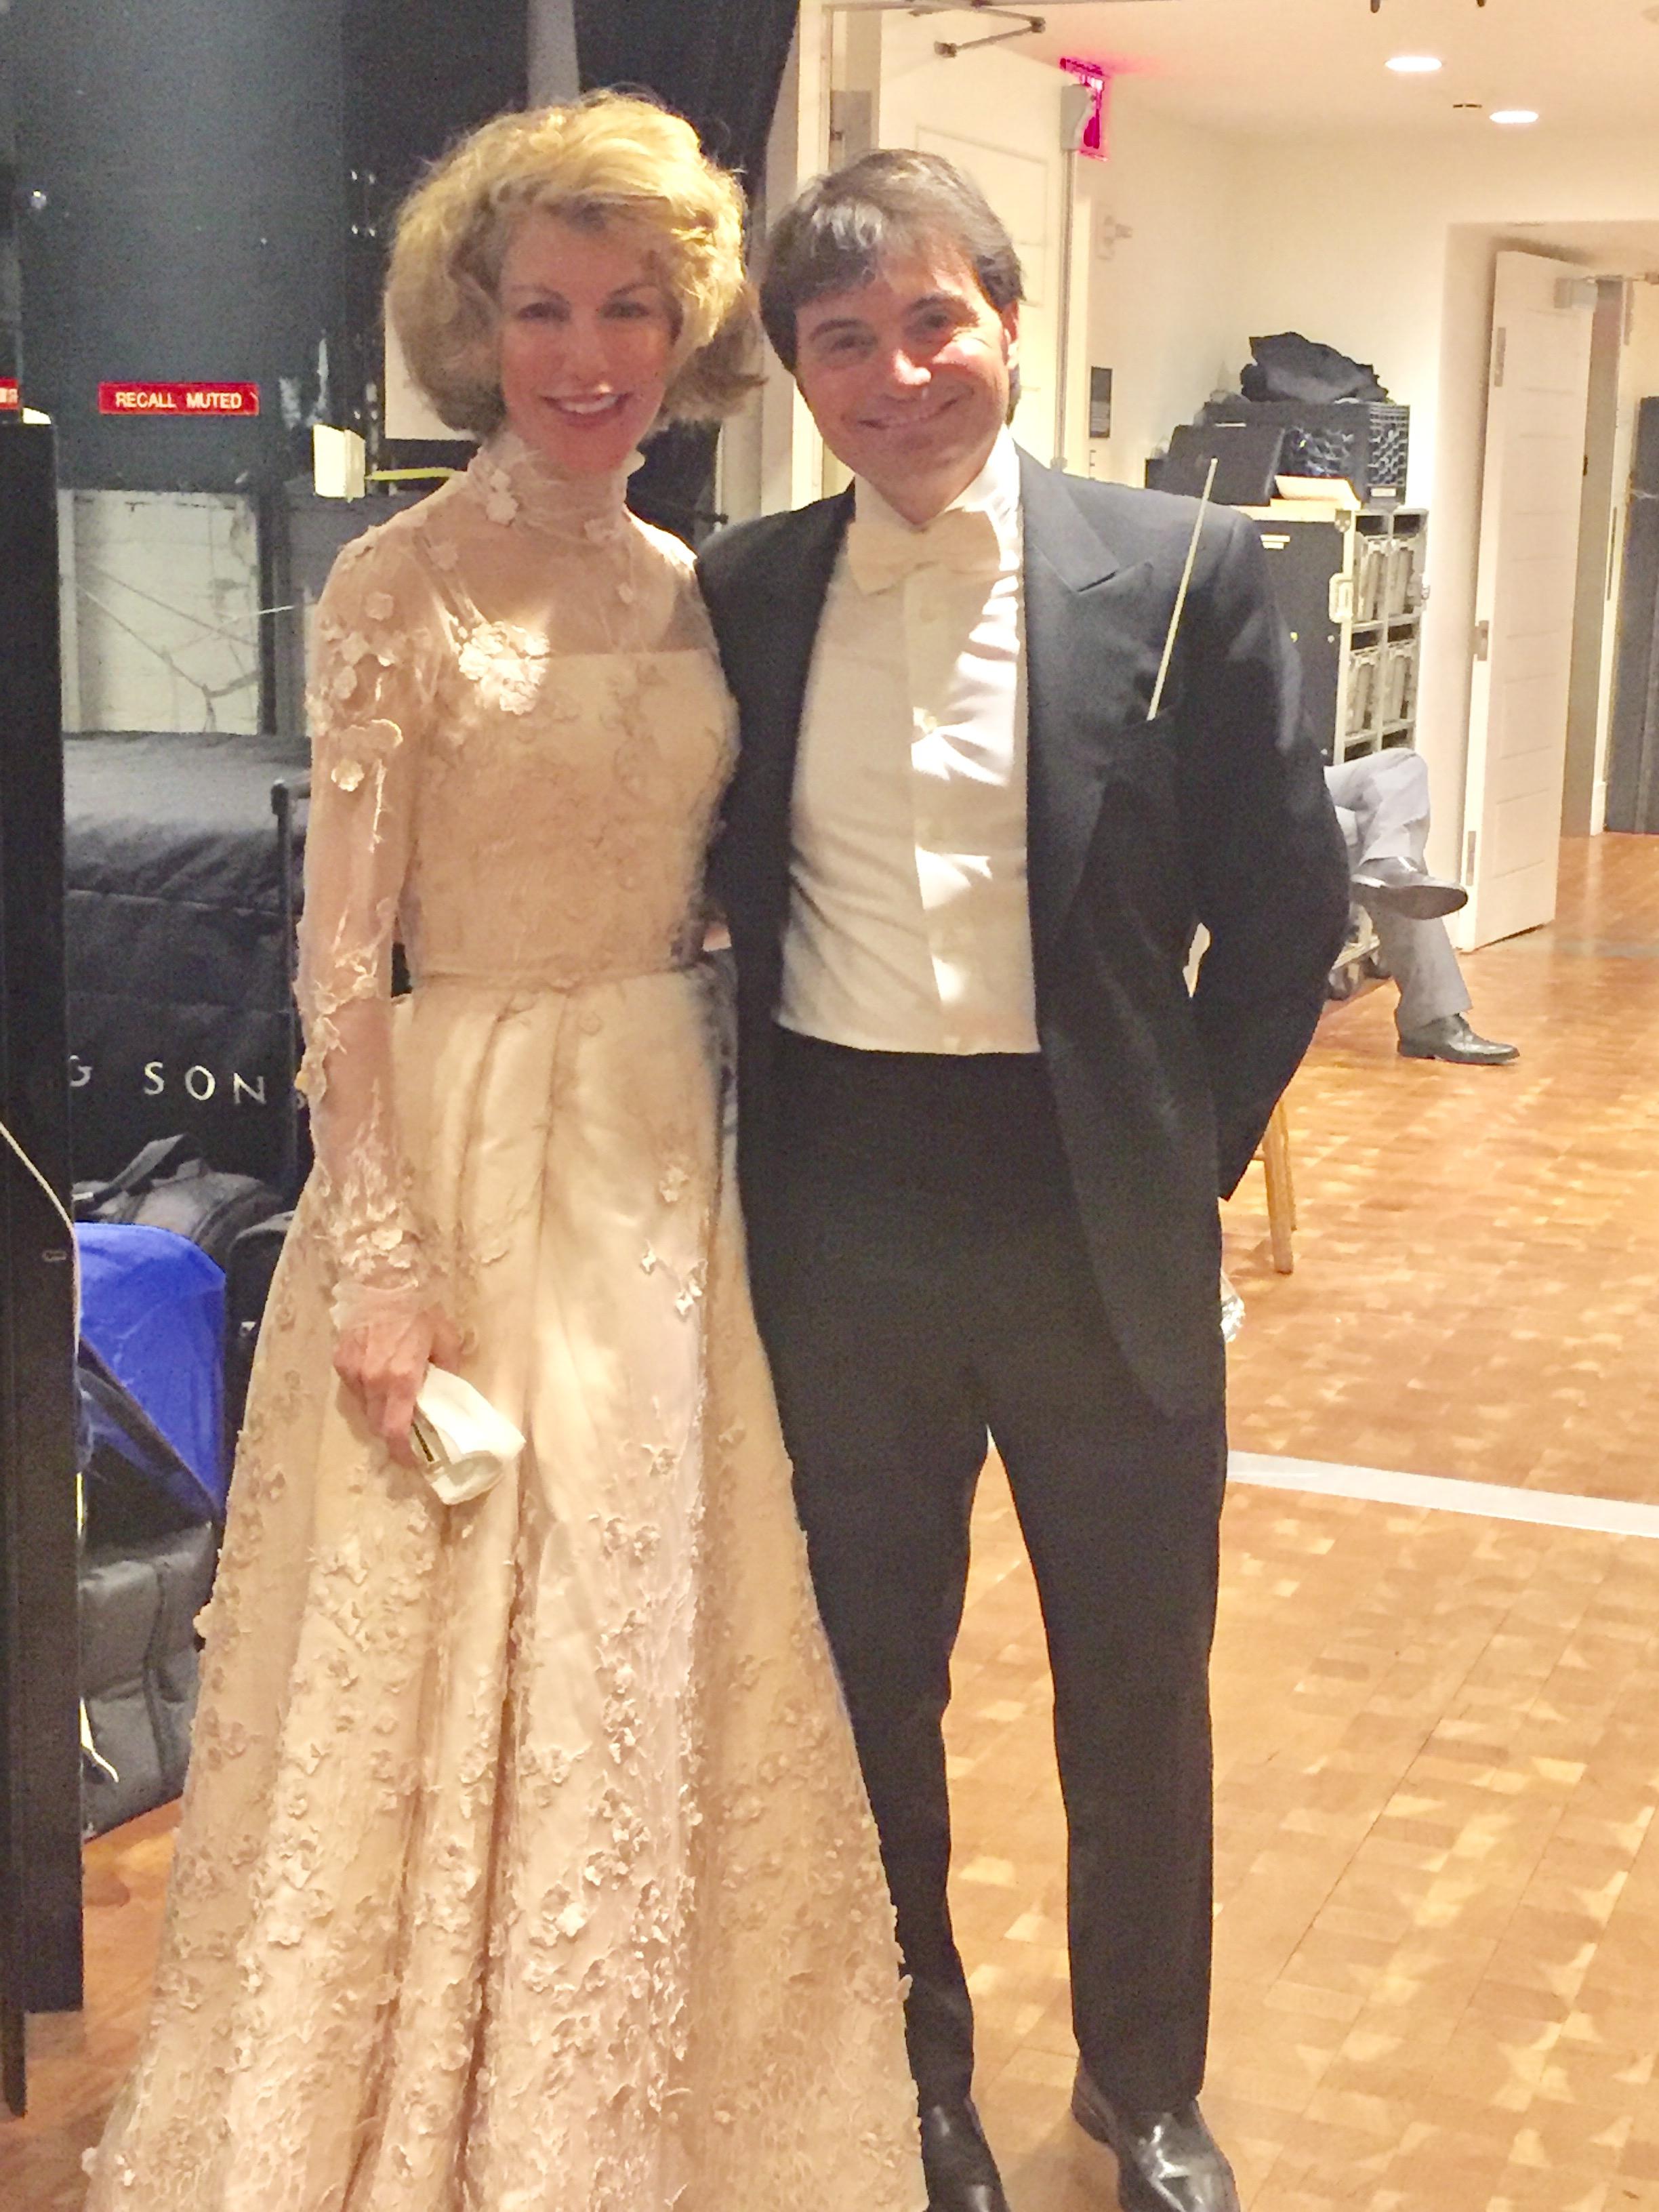 Lisa with Maestro Capocaccia